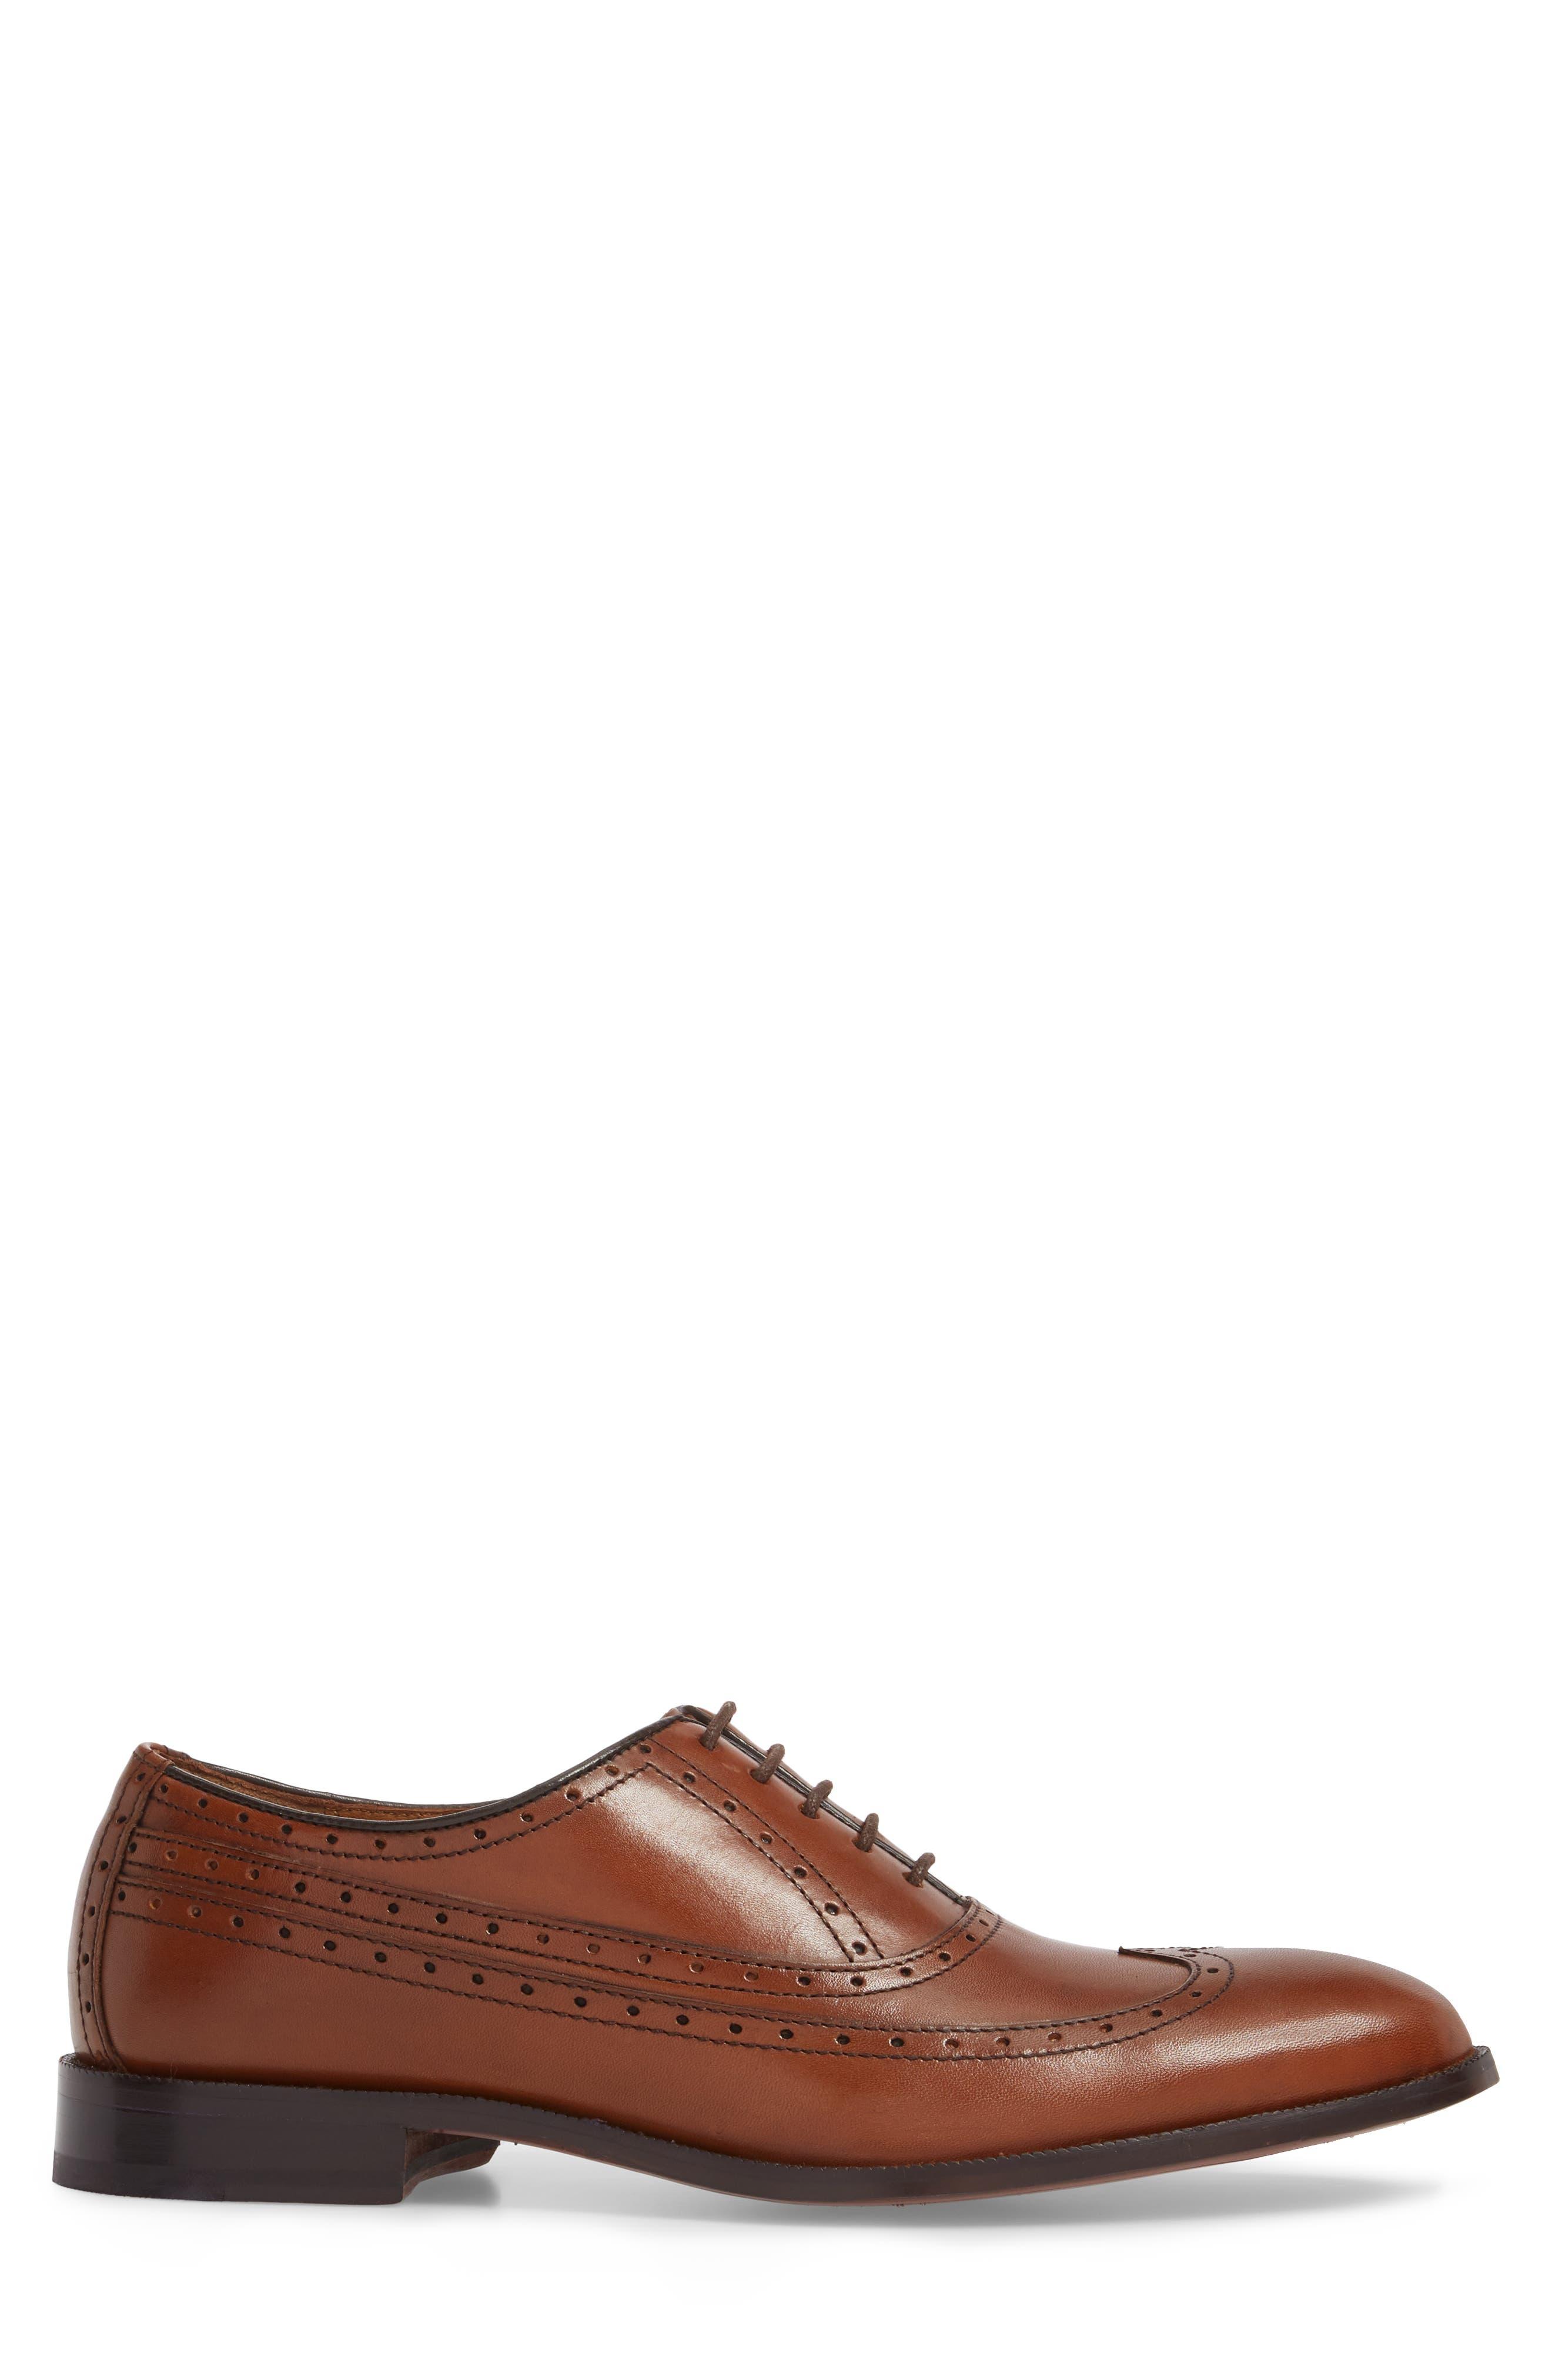 Bradford Wingtip Oxford,                             Alternate thumbnail 3, color,                             Tan Leather